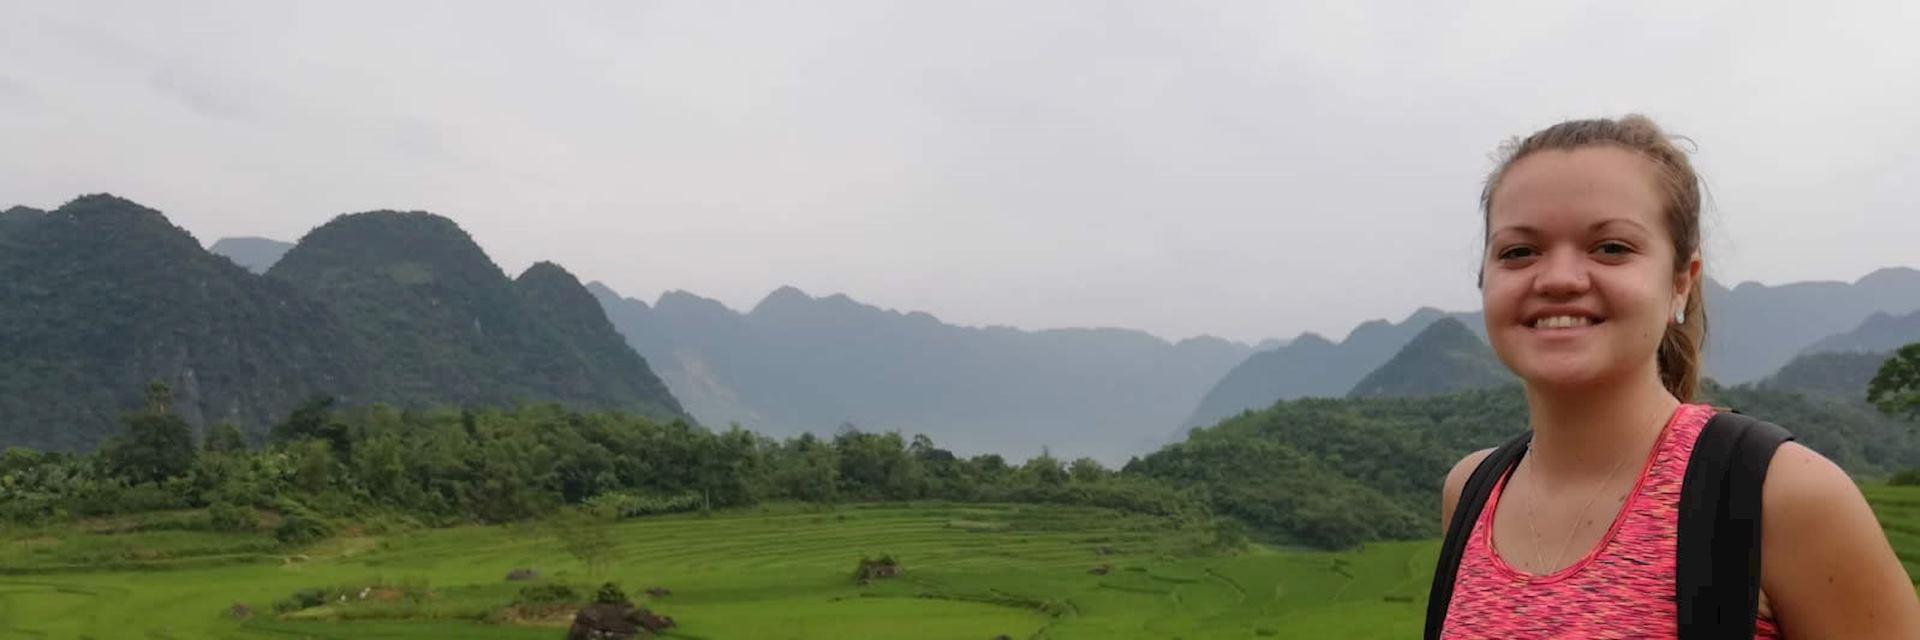 Megan trekking in Pù Luông Nature Reserve, northern Vietnam